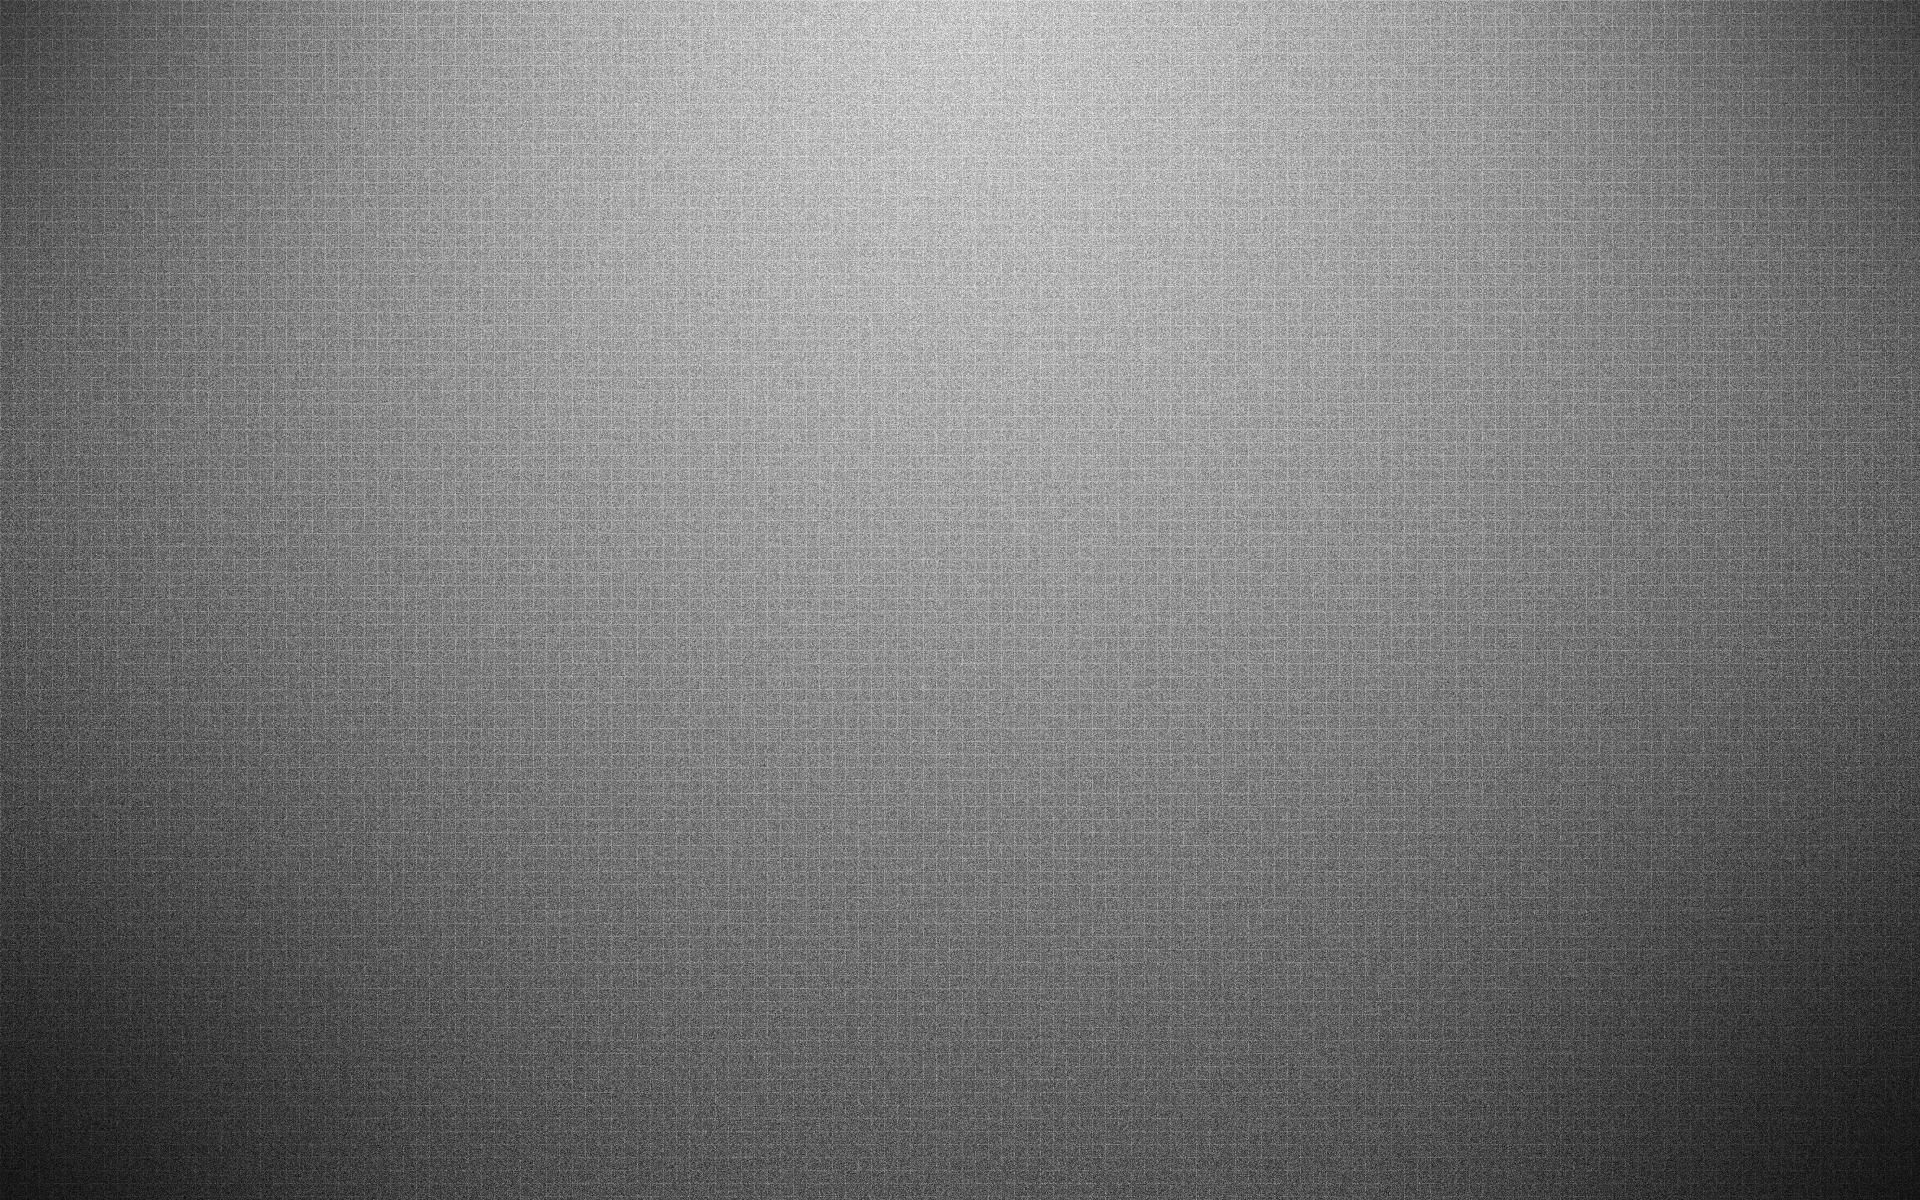 Neutral Desktop Wallpapers - Top Free Neutral Desktop ...